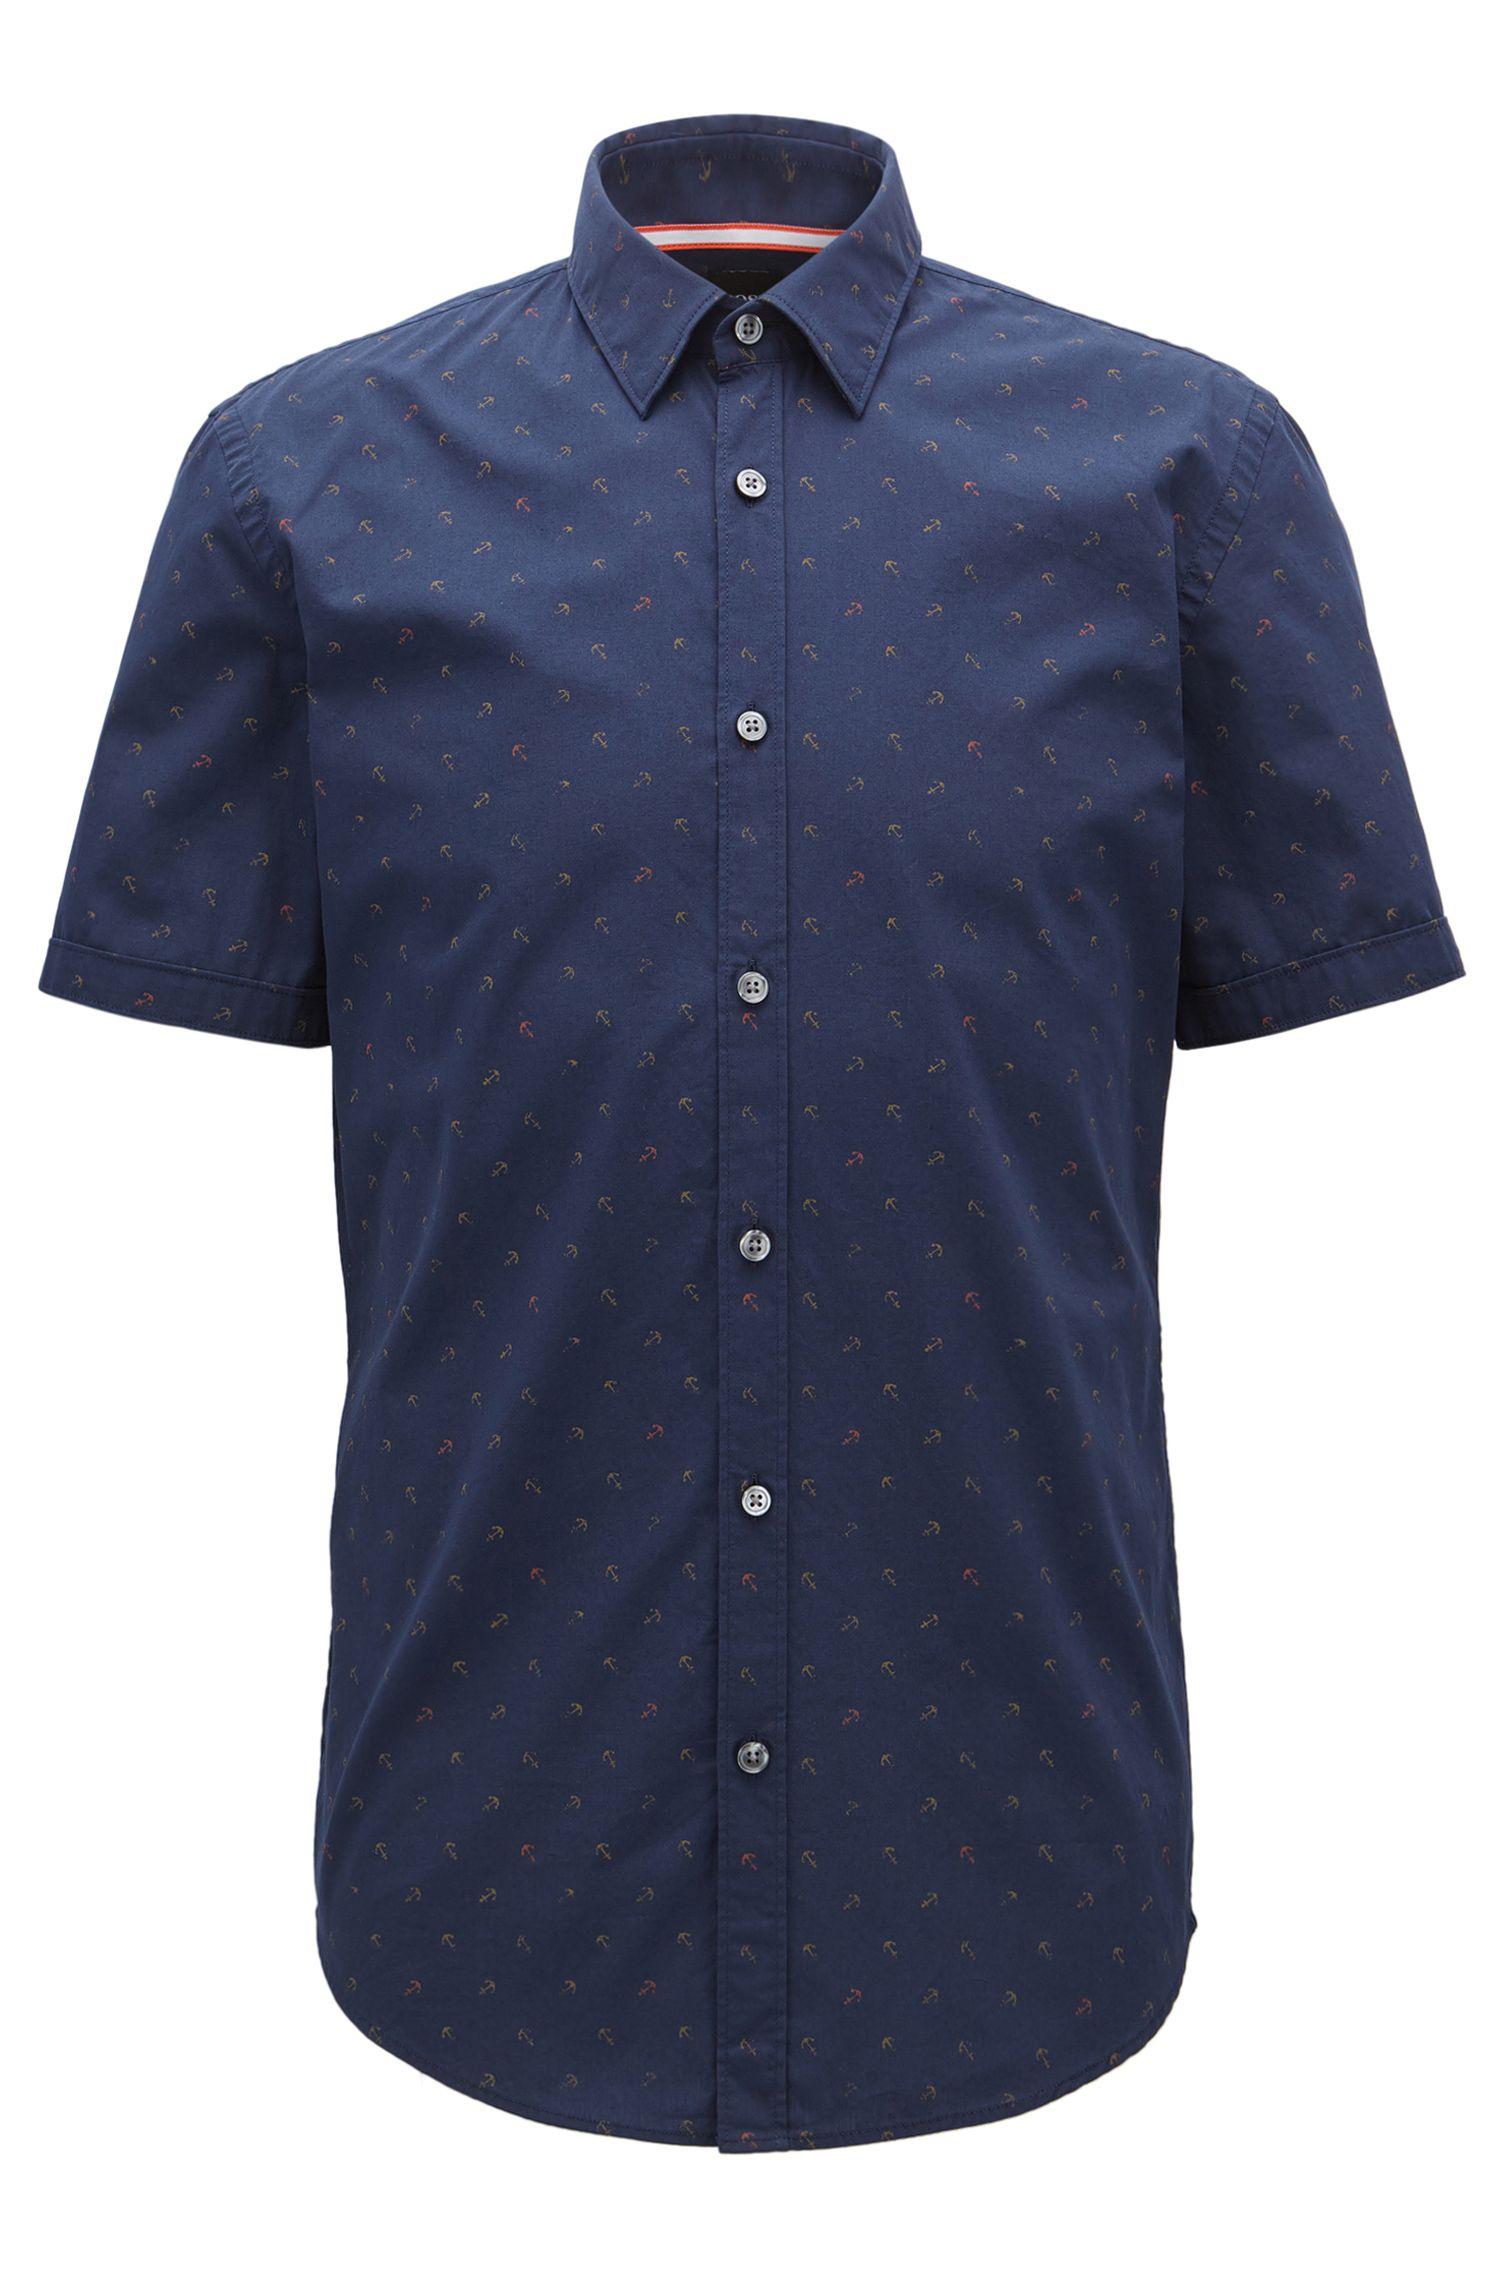 Anchor-Print Sport Shirt, Slim Fit | Ronn